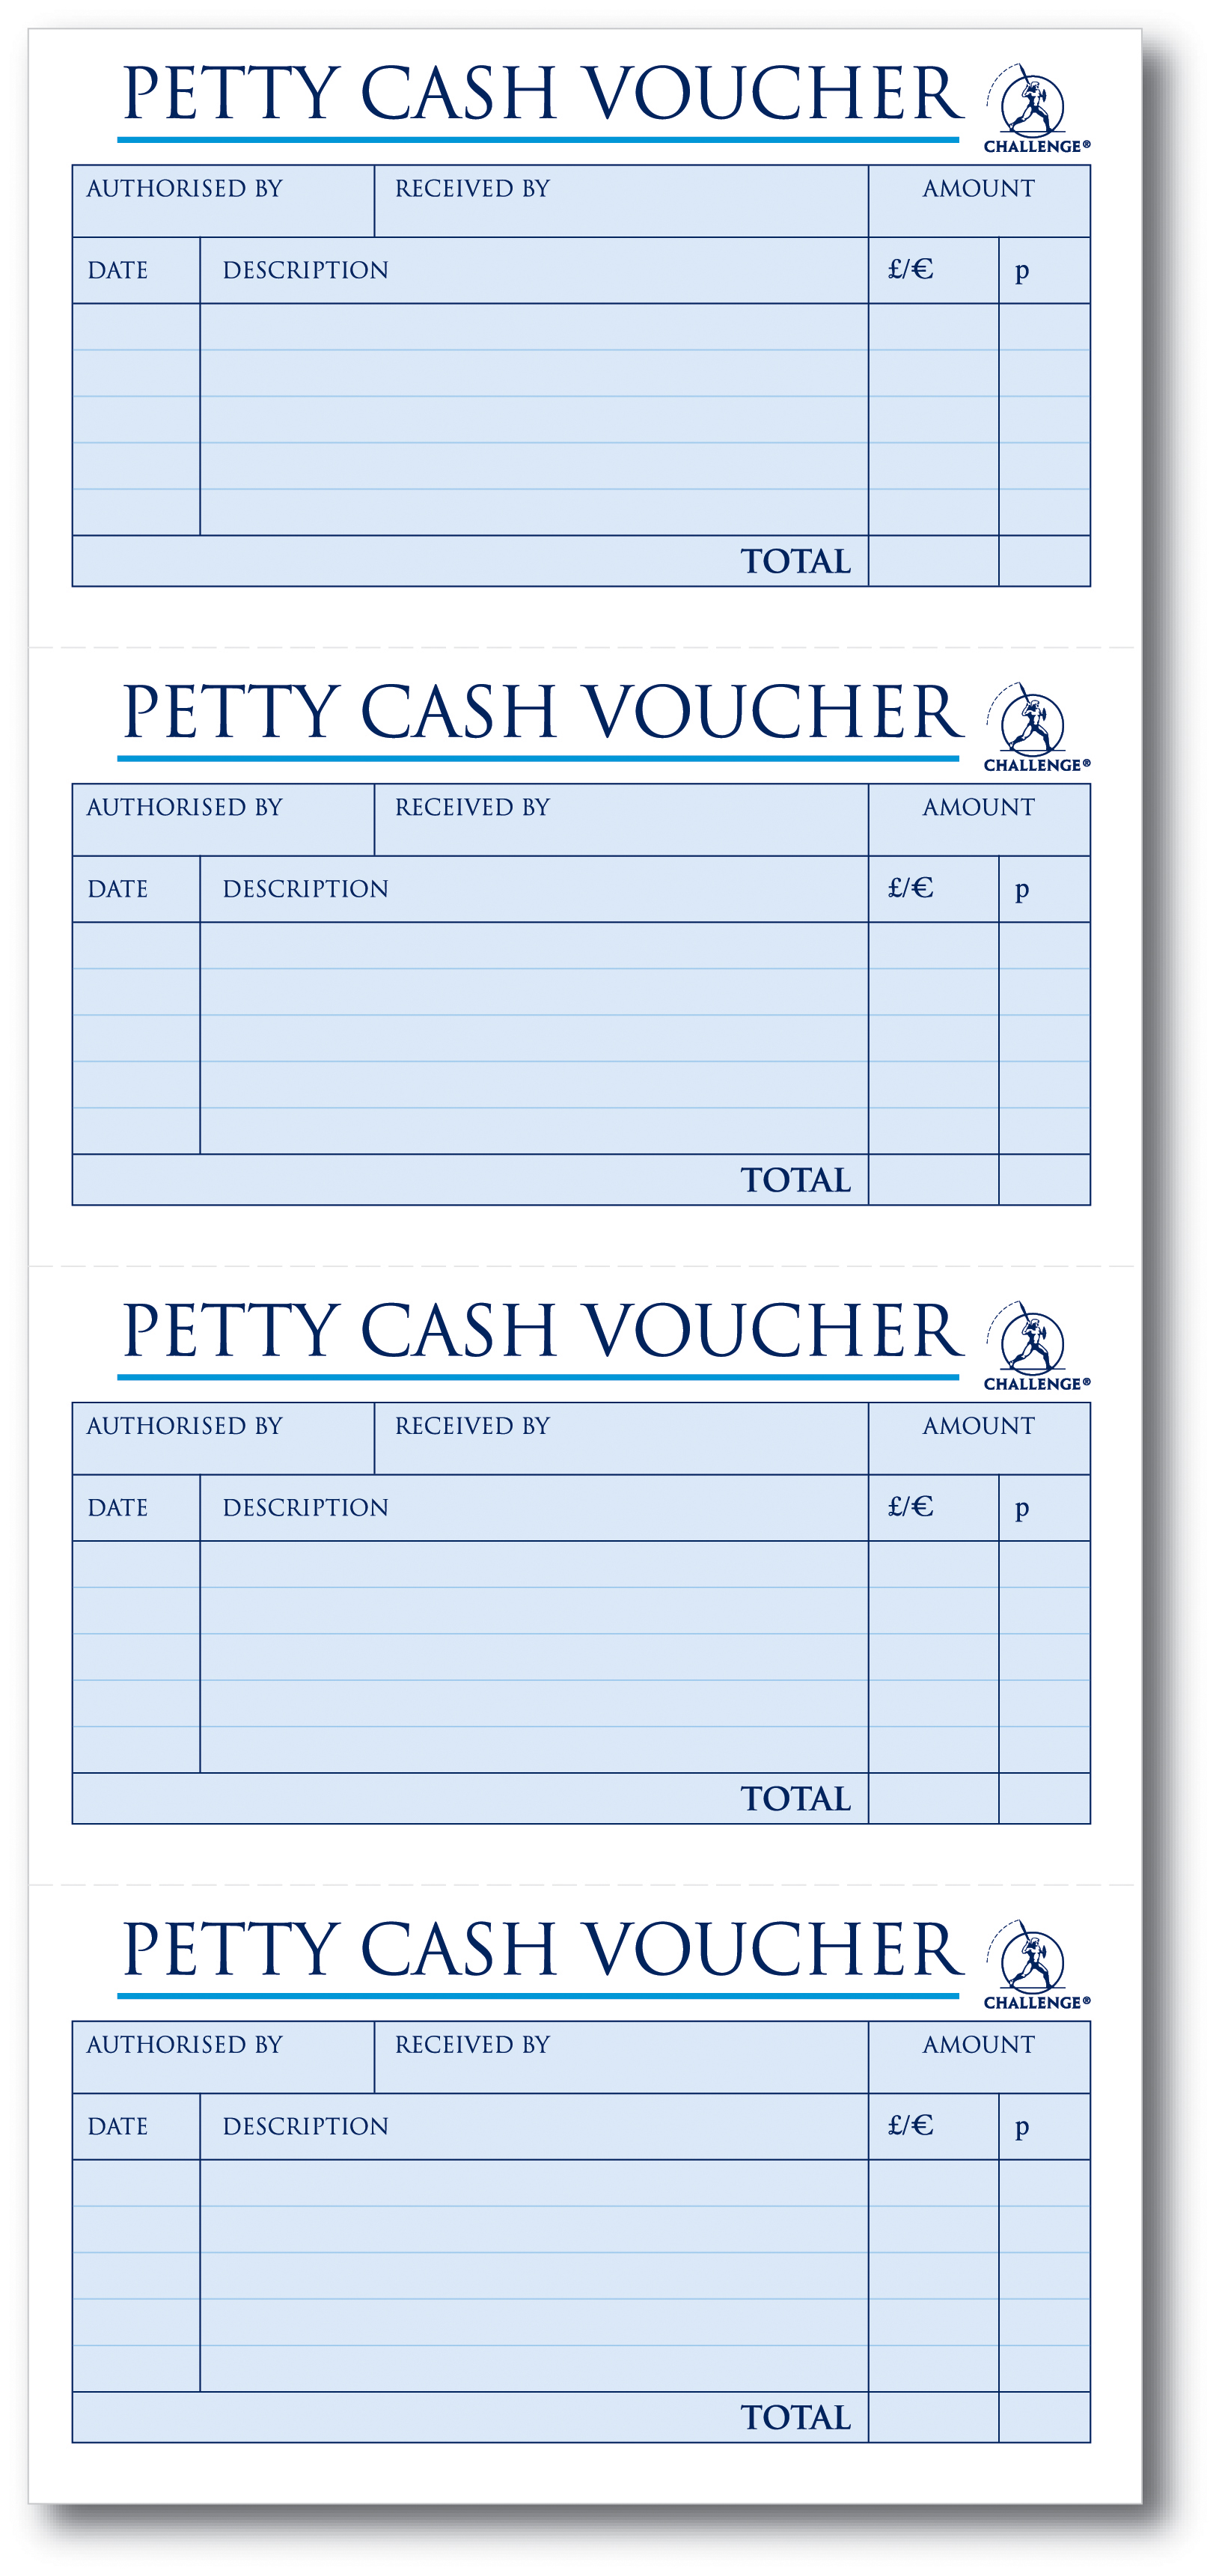 petty cash slips